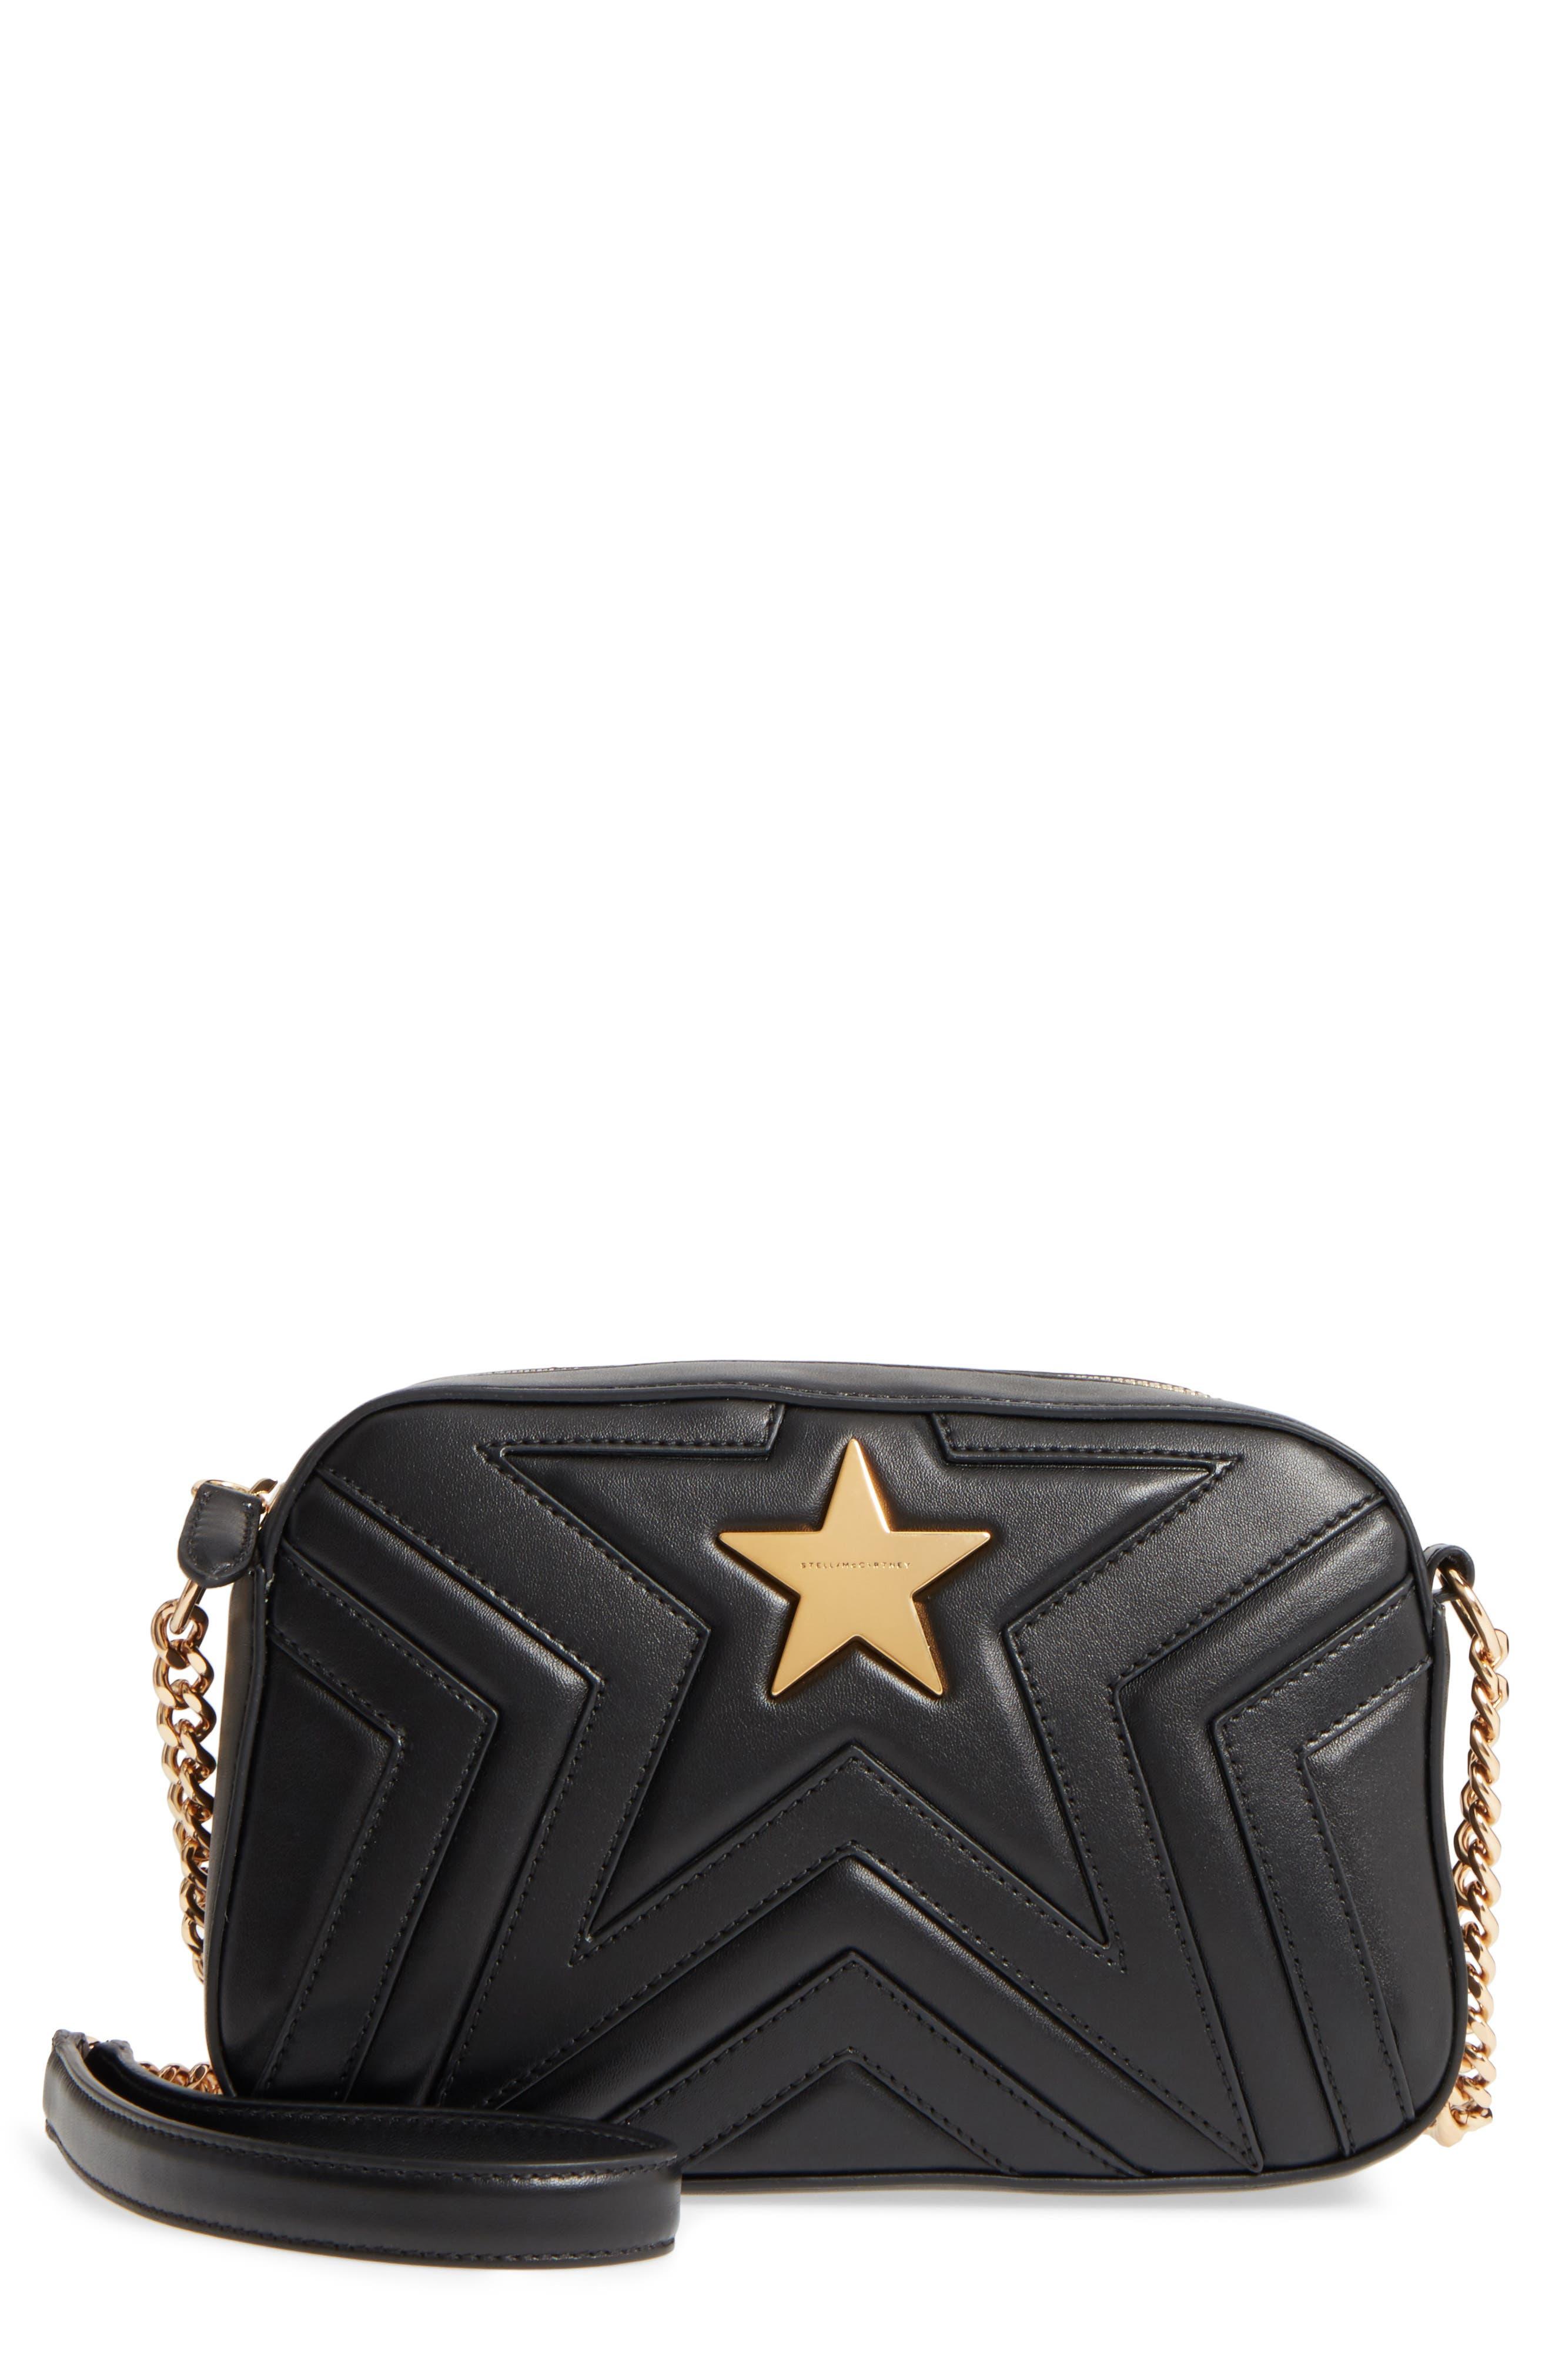 Alter Nappa Faux Leather Shoulder Bag,                         Main,                         color, BLACK